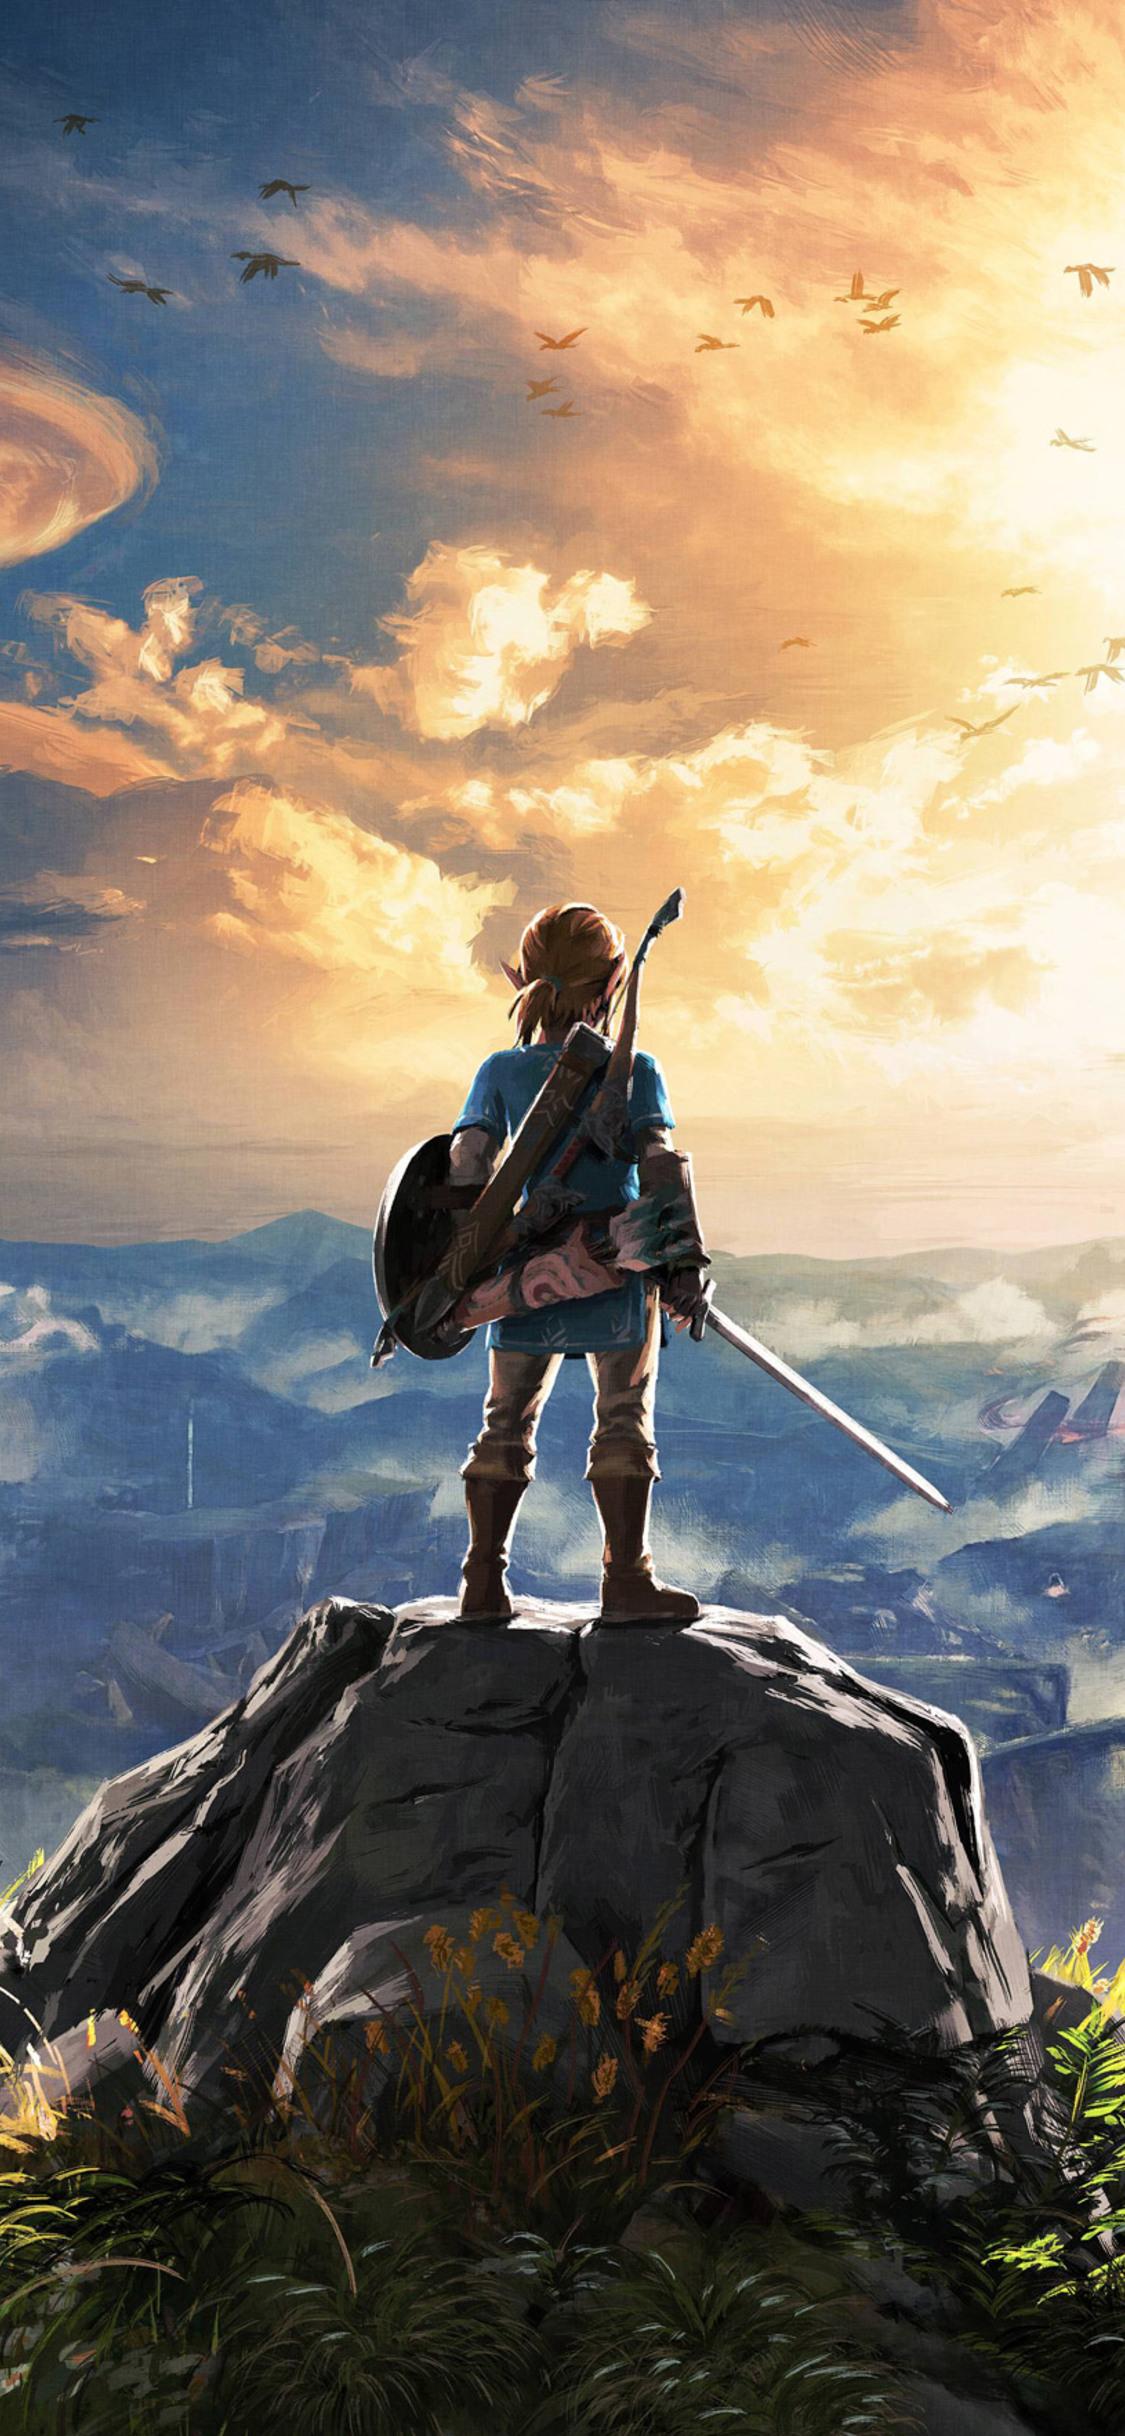 Legend Of Zelda Breath Of The Wild Desktop Wallpaper Posted By